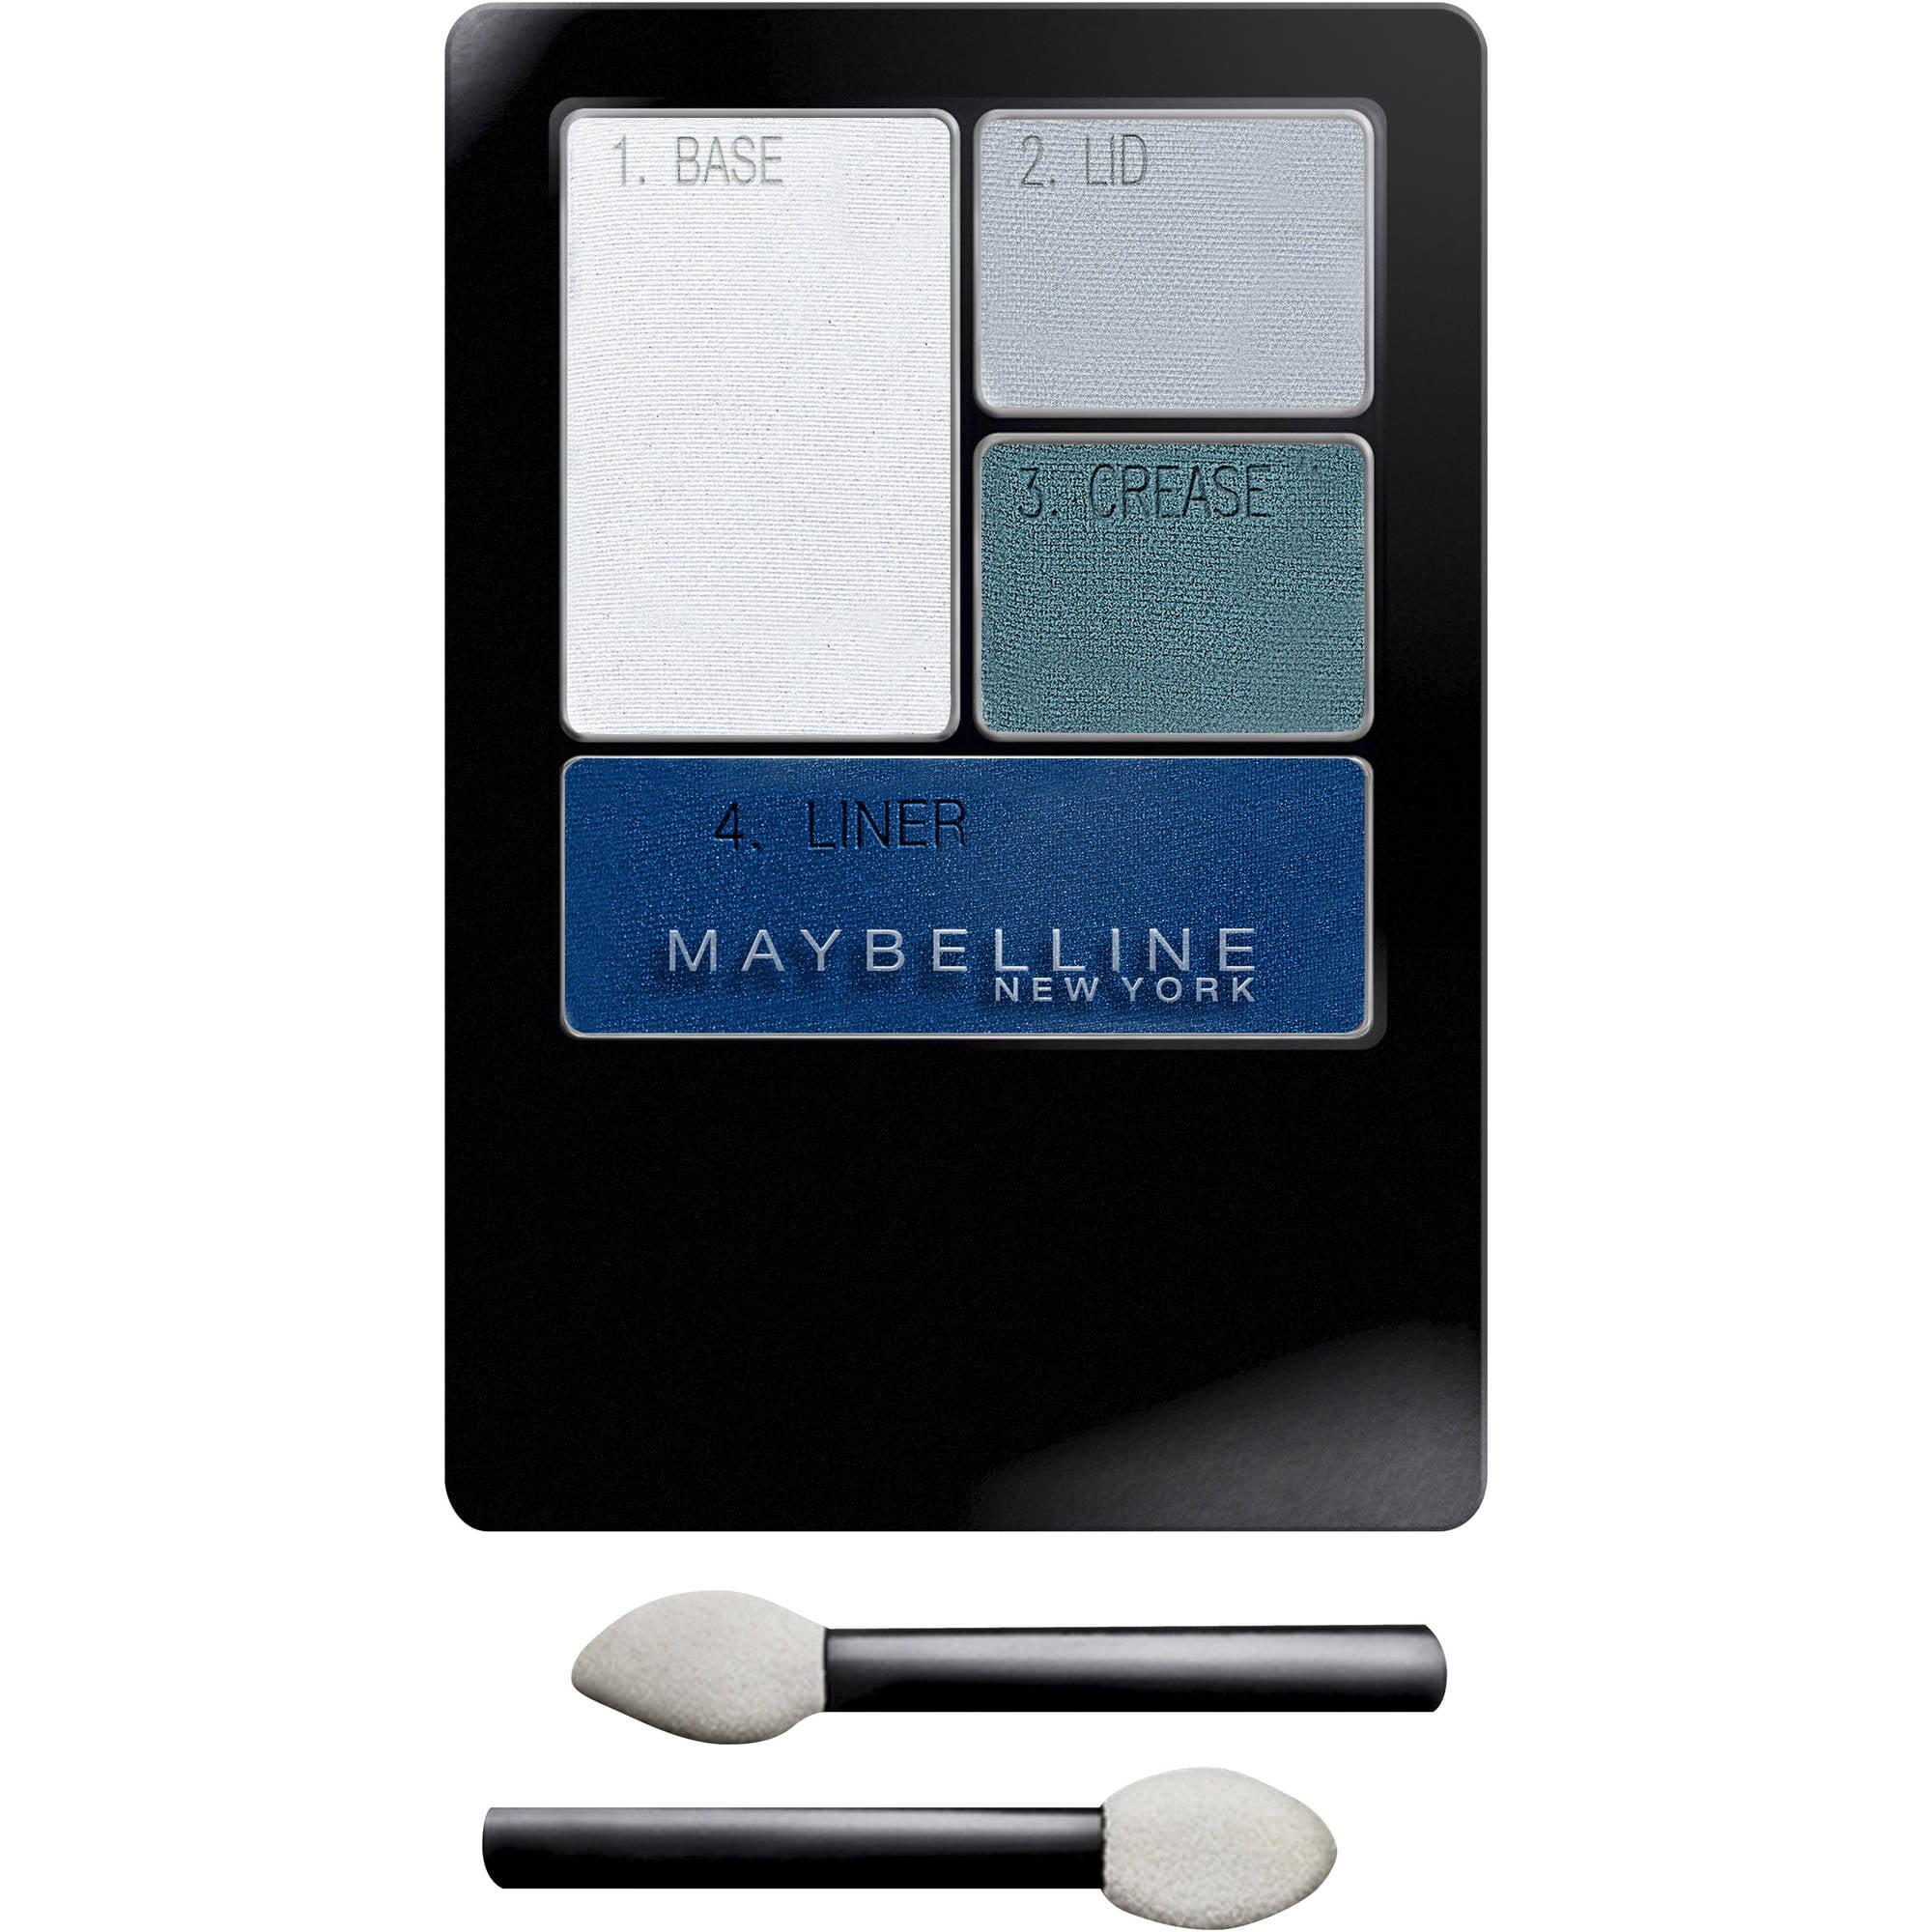 Maybelline New York Expert Wear Eyeshadow Quads, Olive Martini, 0.17 oz